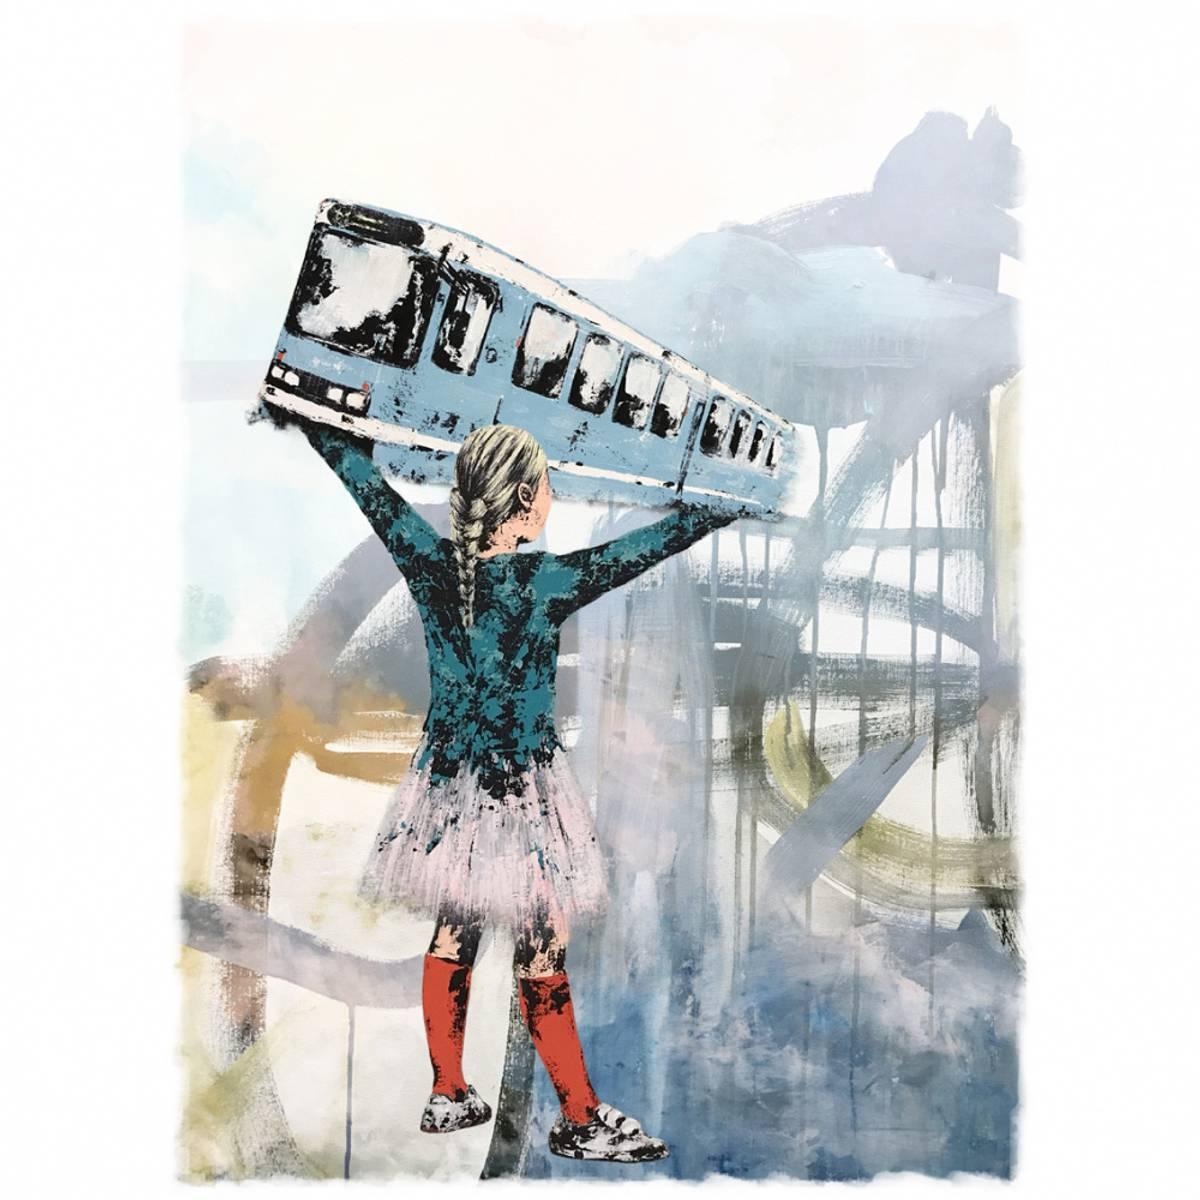 BYJENTE (30x40cm) kunstplakat